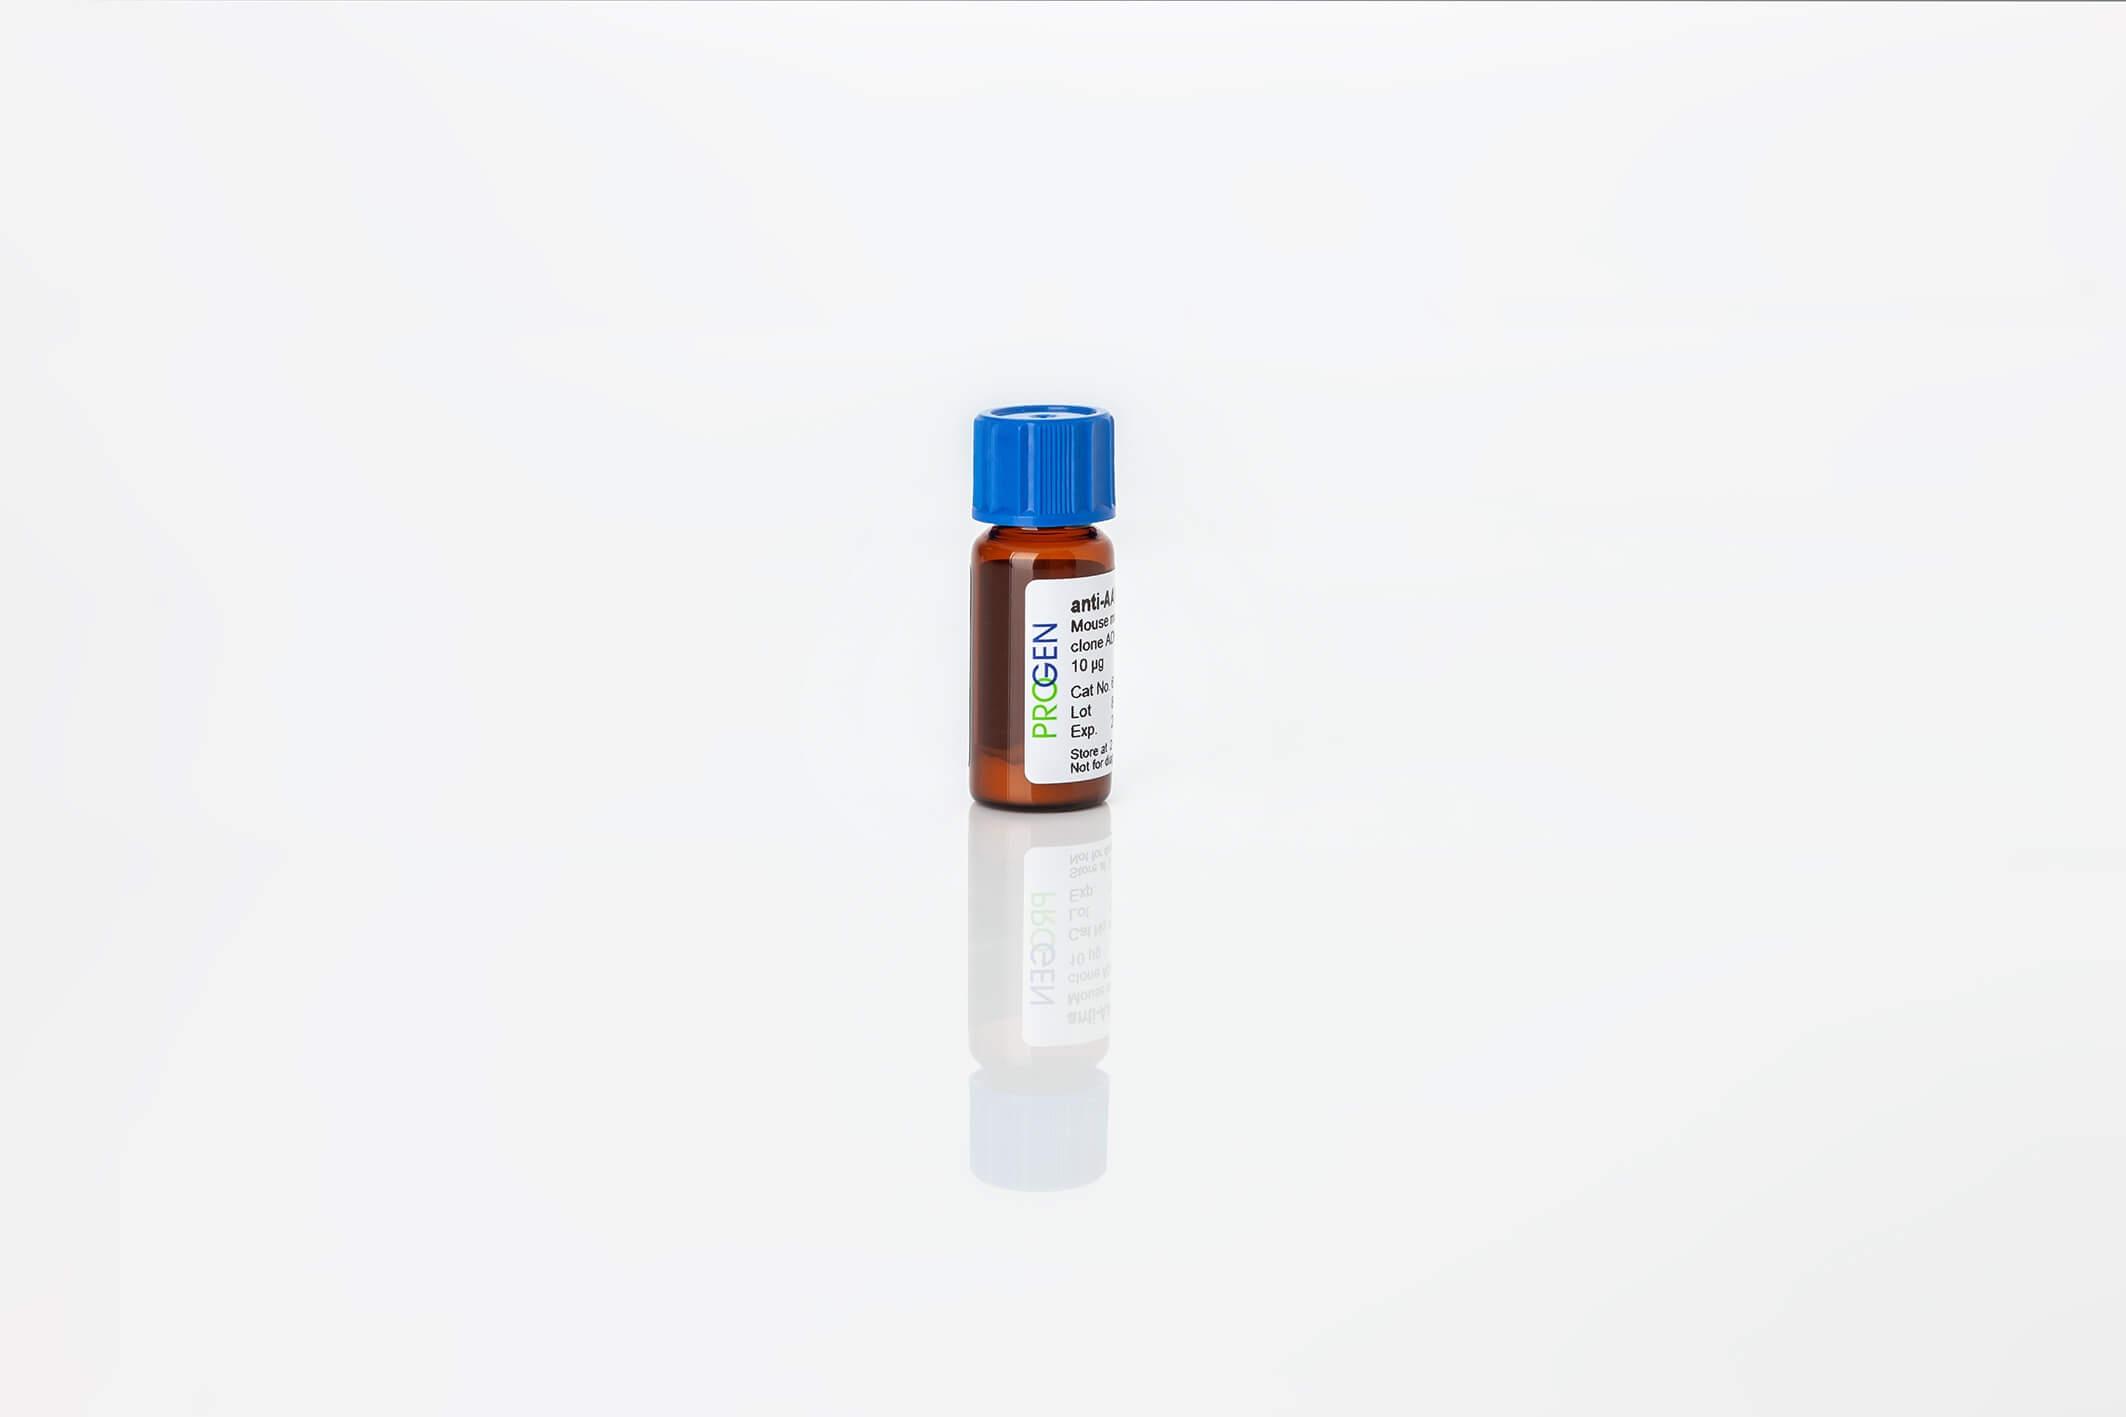 anti-Perilipin 4 (N-terminus) guinea pig polyclonal, serum